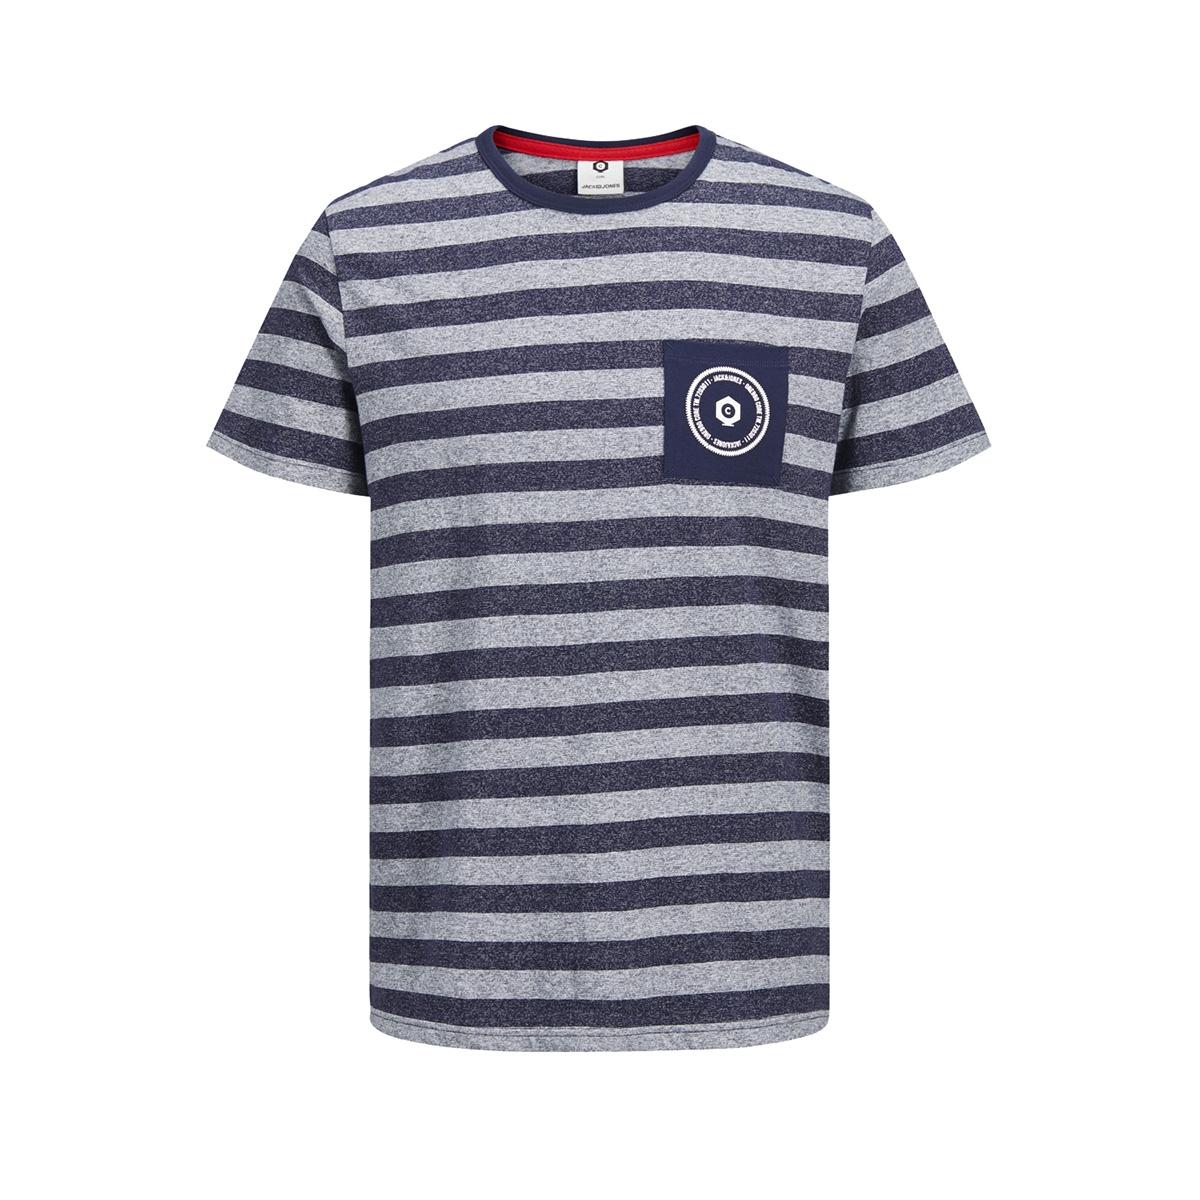 jcodenny tee ss crew neck 12148515 jack & jones t-shirt maritime blue/slim